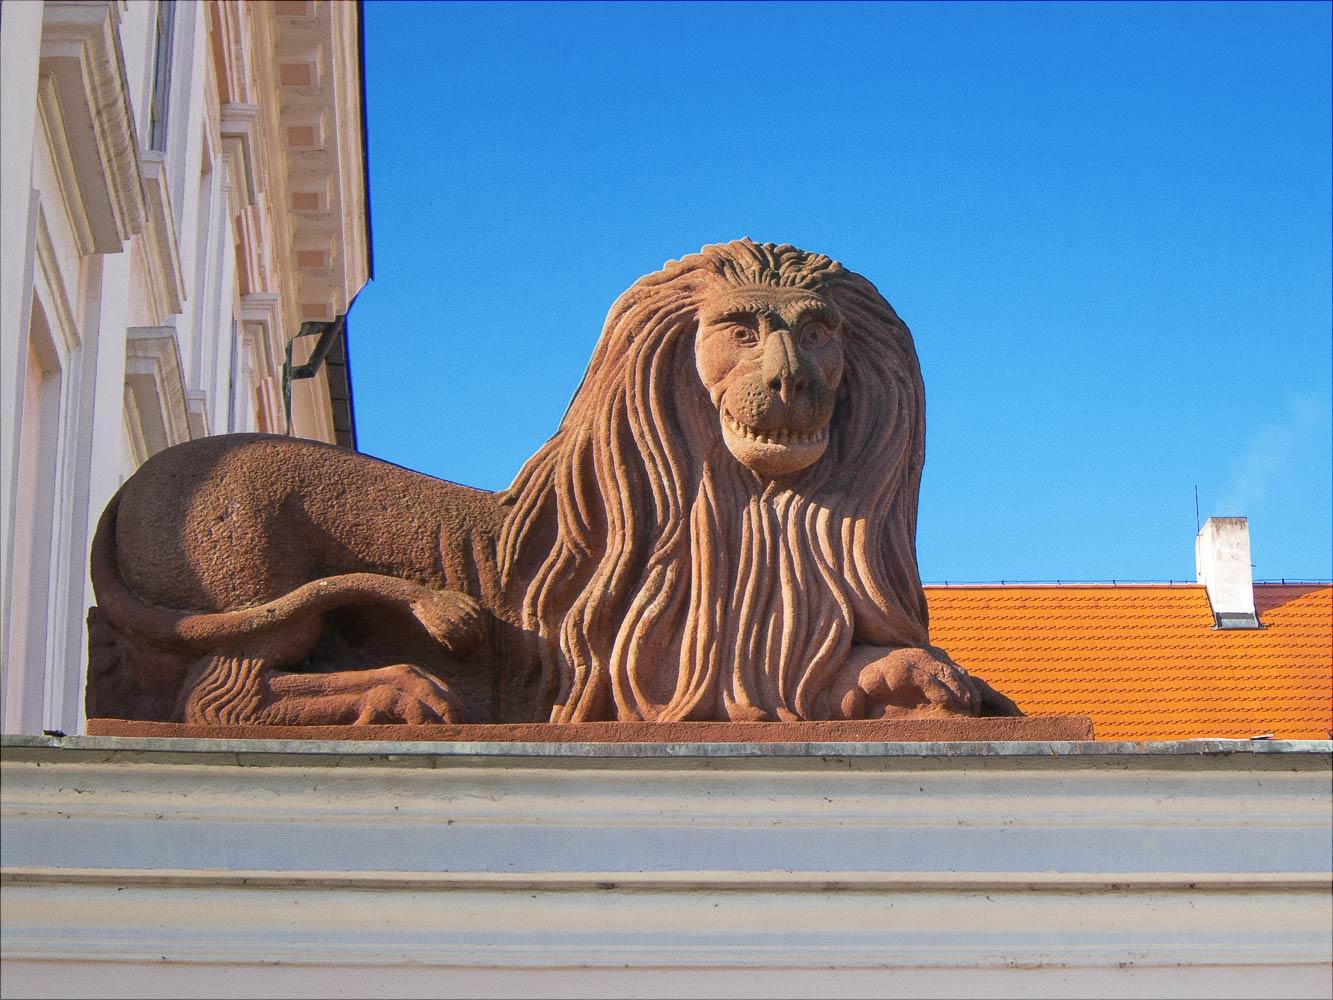 Улыбочка. Влашимский лев